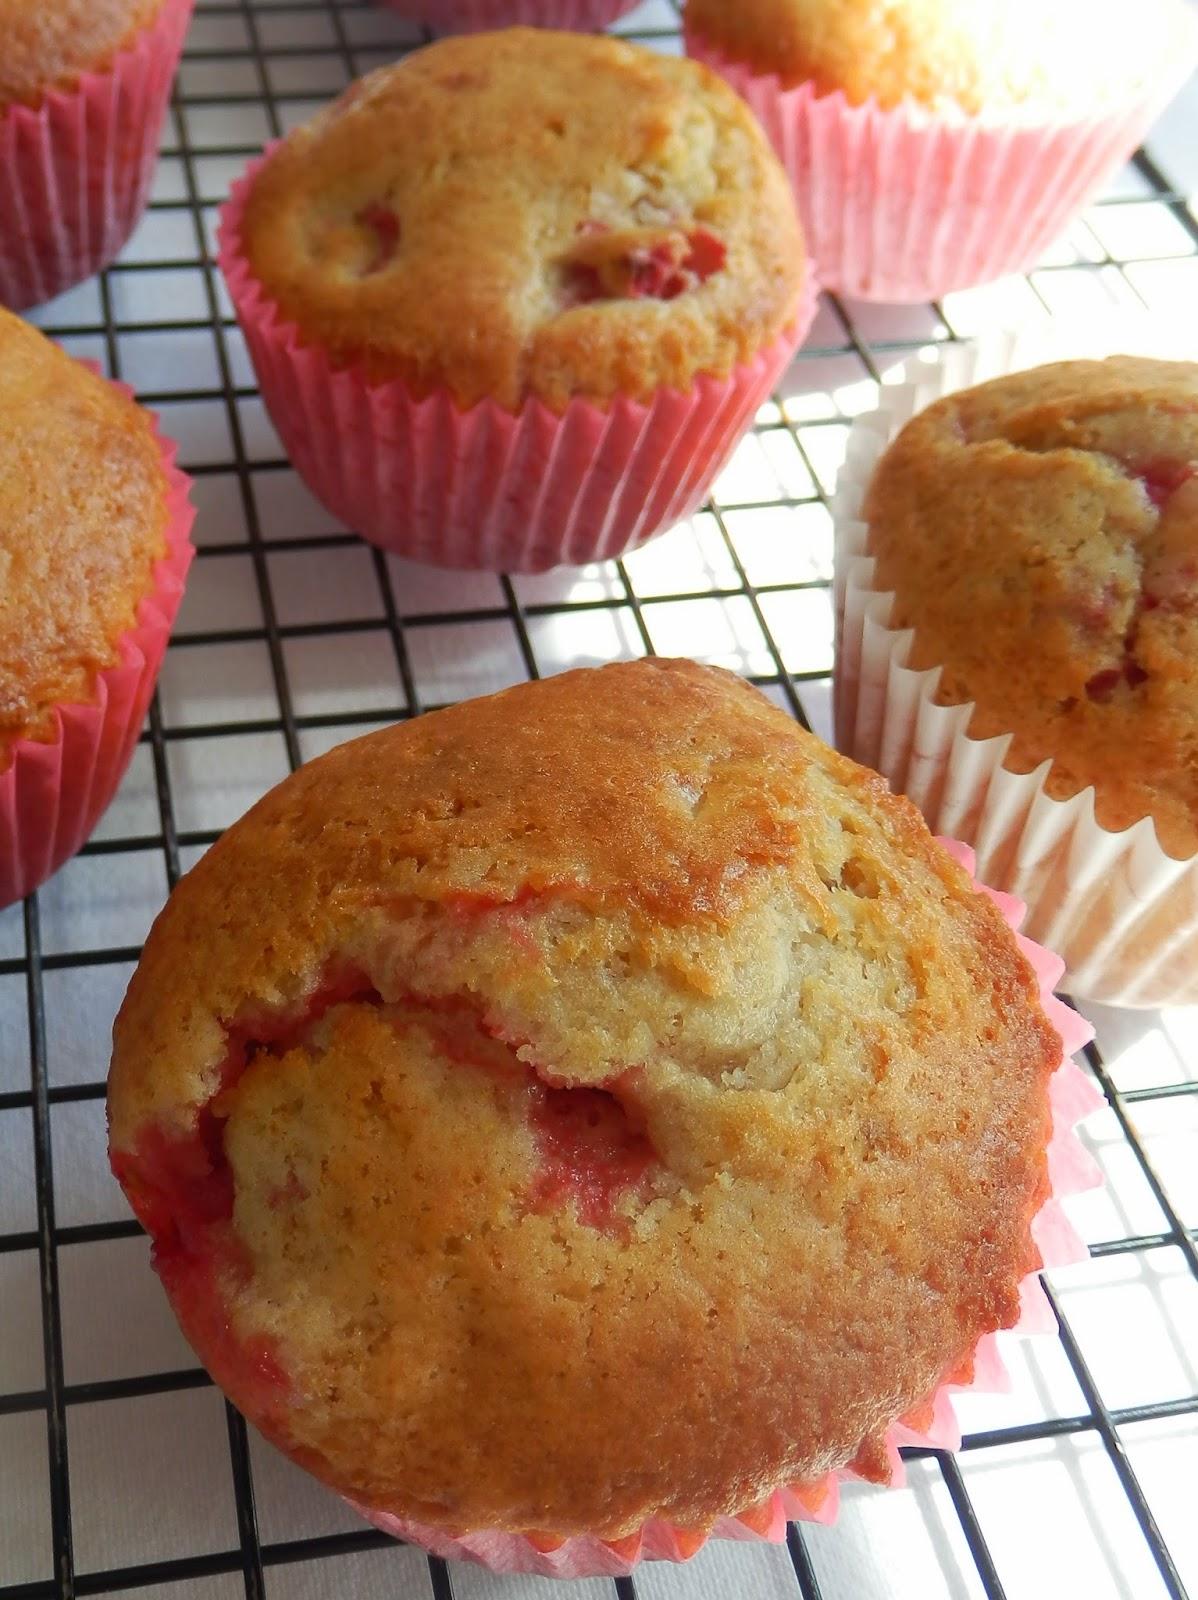 Strawberry and Orange muffins